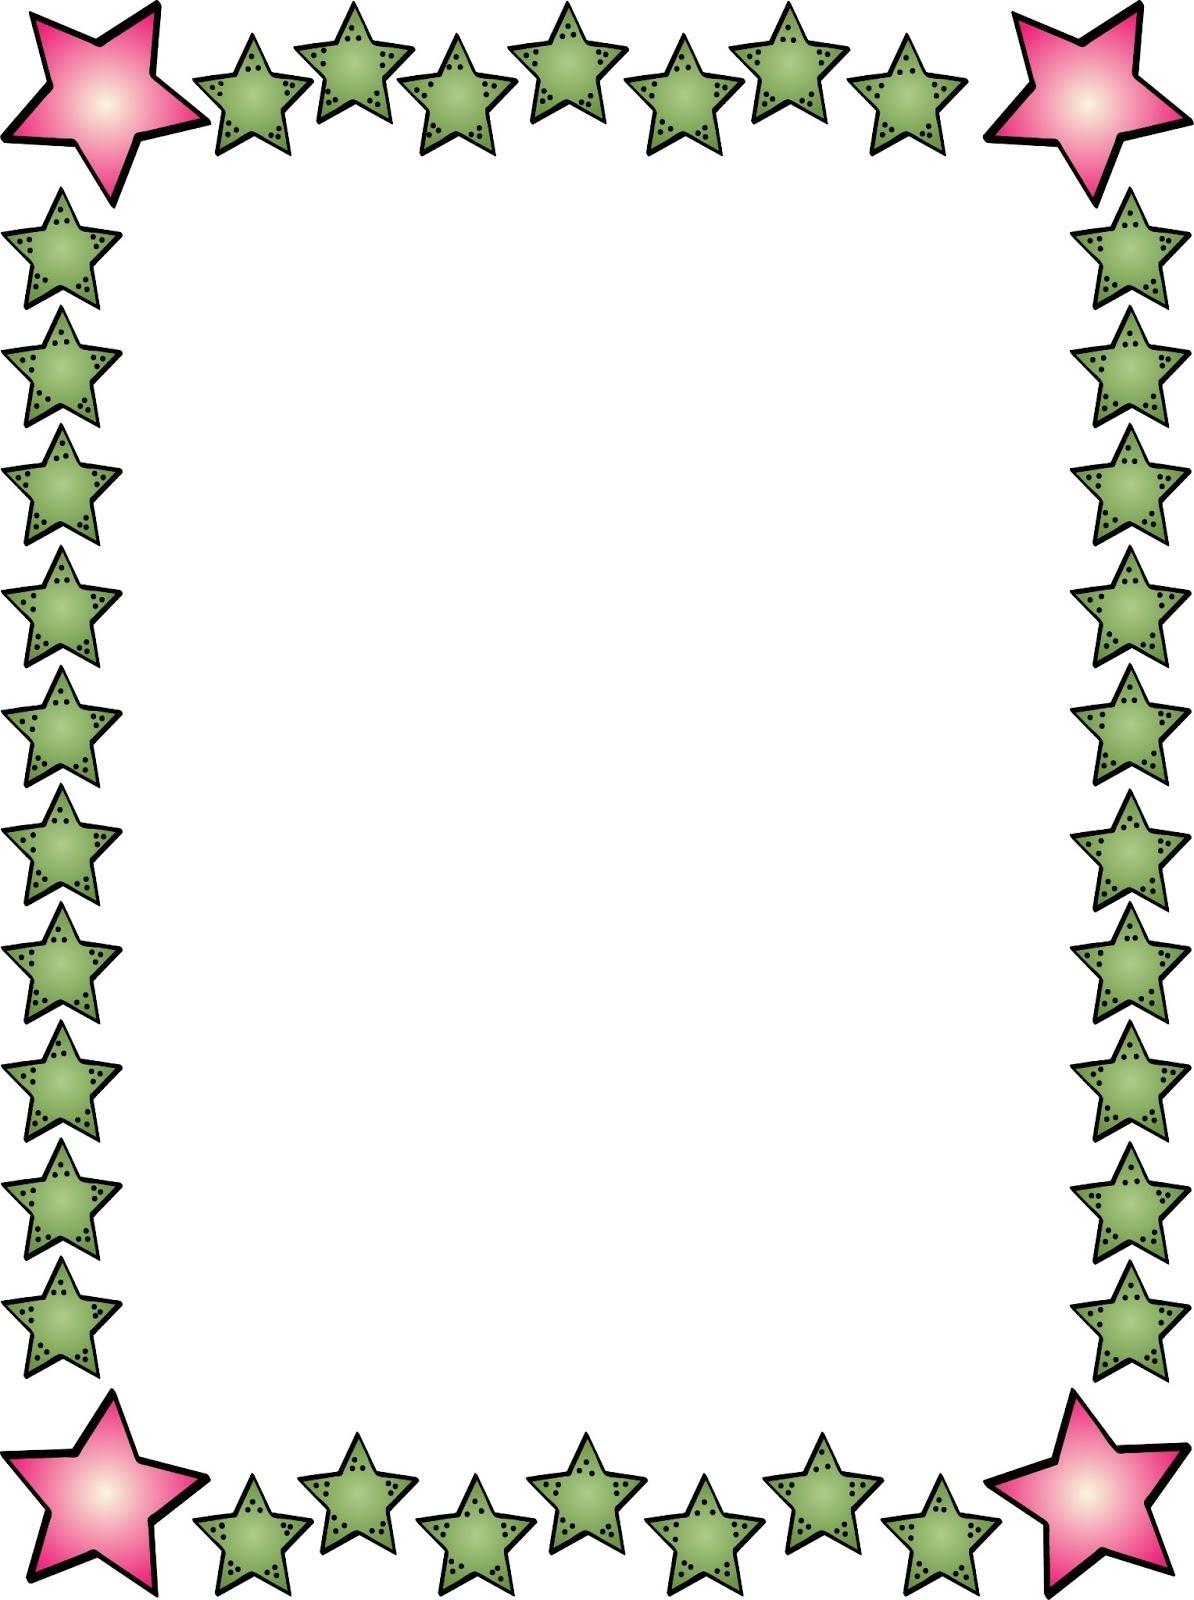 1194x1600 Free Clip Art Borders Stars Bordes Y Marcos